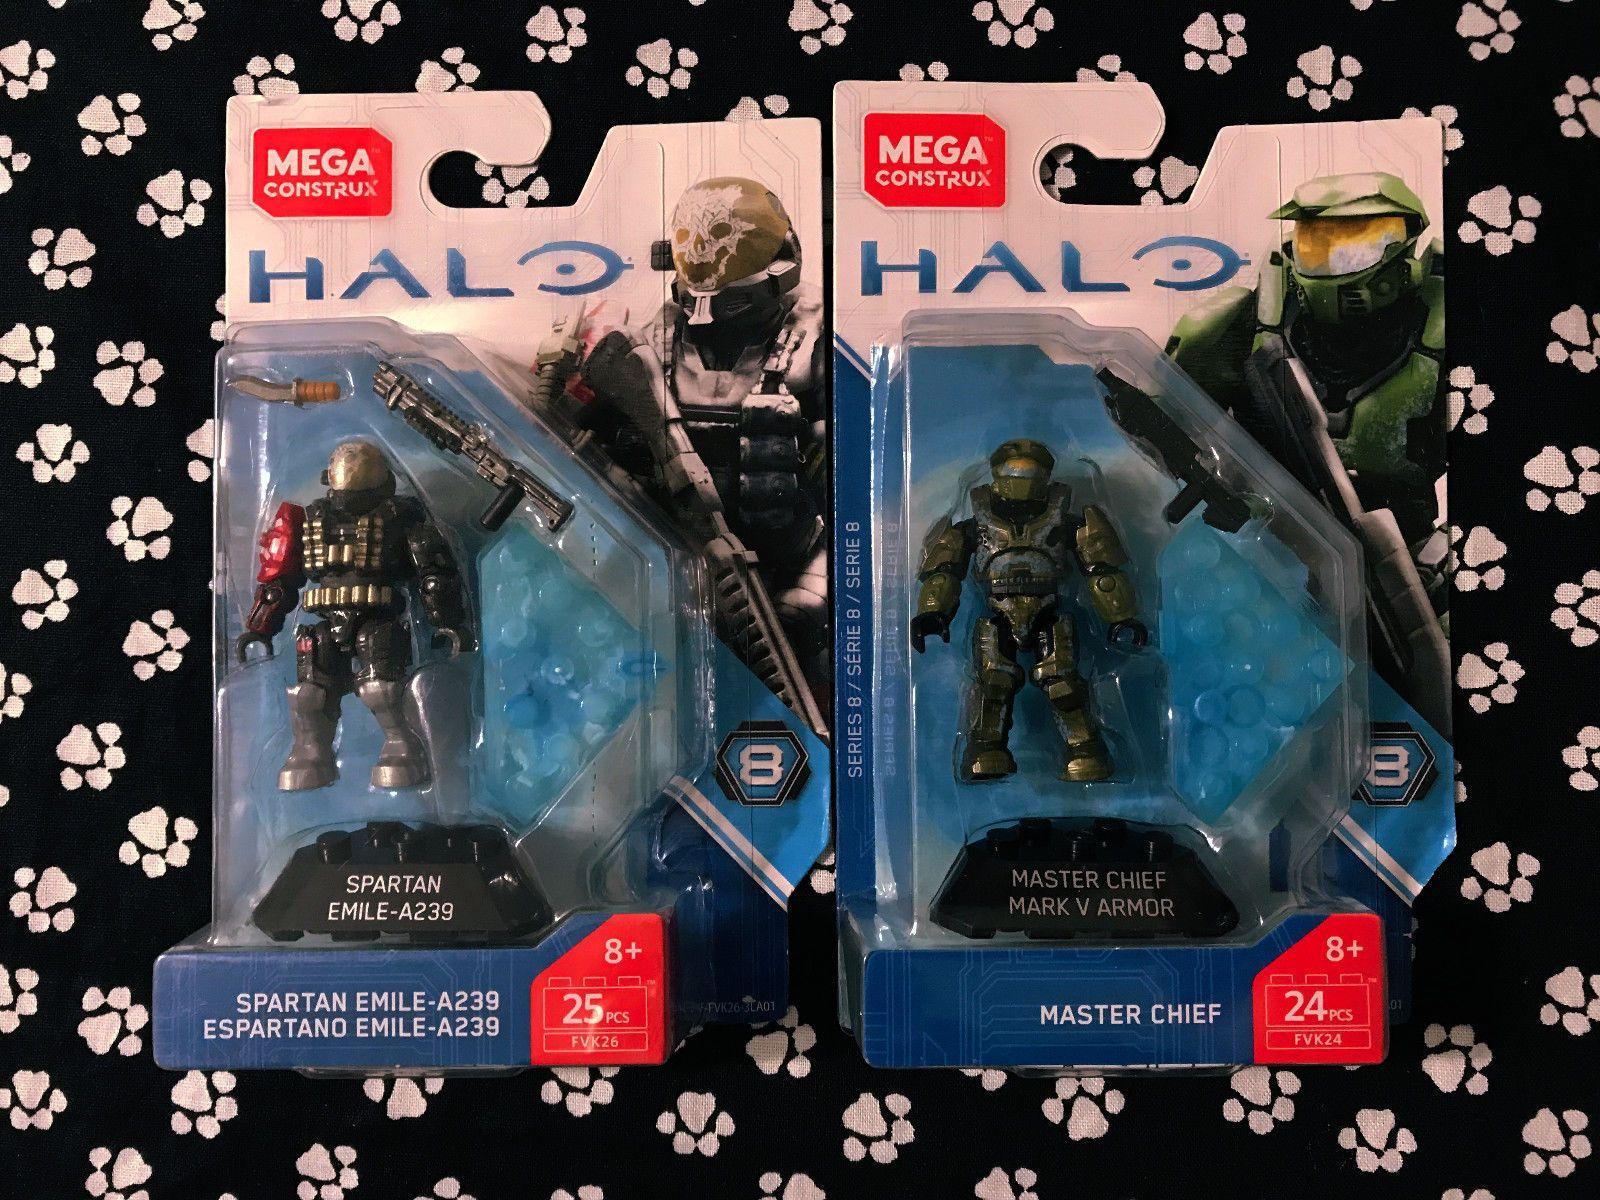 Mega Construx Heroes Halo Master Chief Mark V Armor Series 8 Micro Figure 24pcs